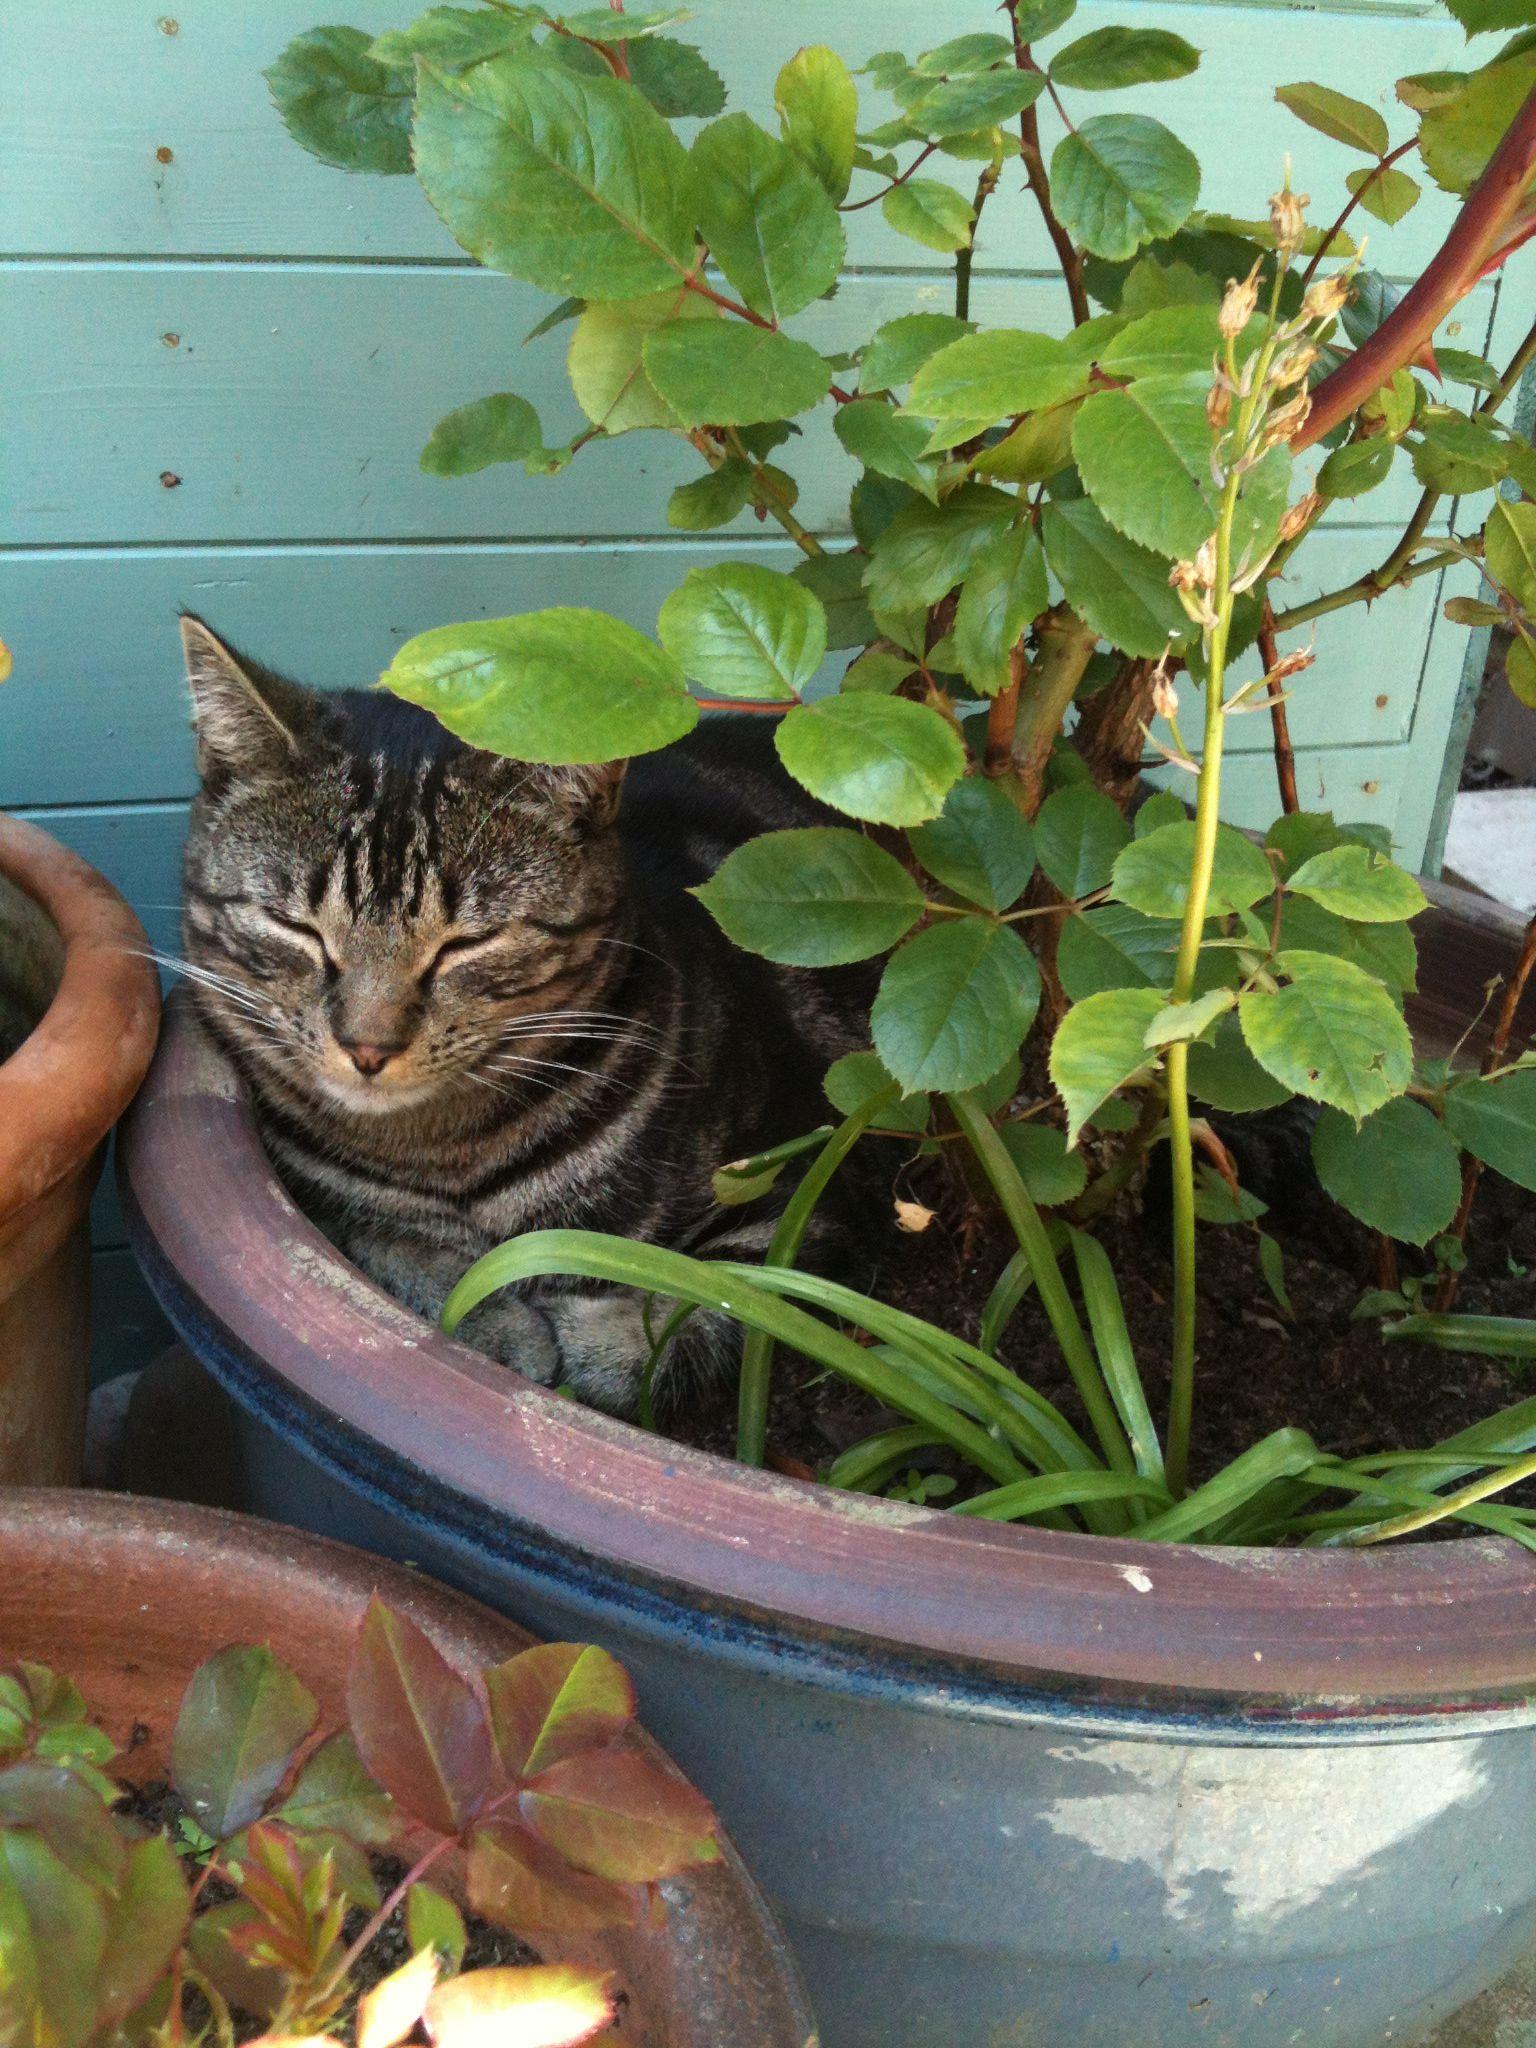 Seeing My Cat Otto Sleeping In His Preferred Flower Pot Kittens Kittens Cutest Cat Garden